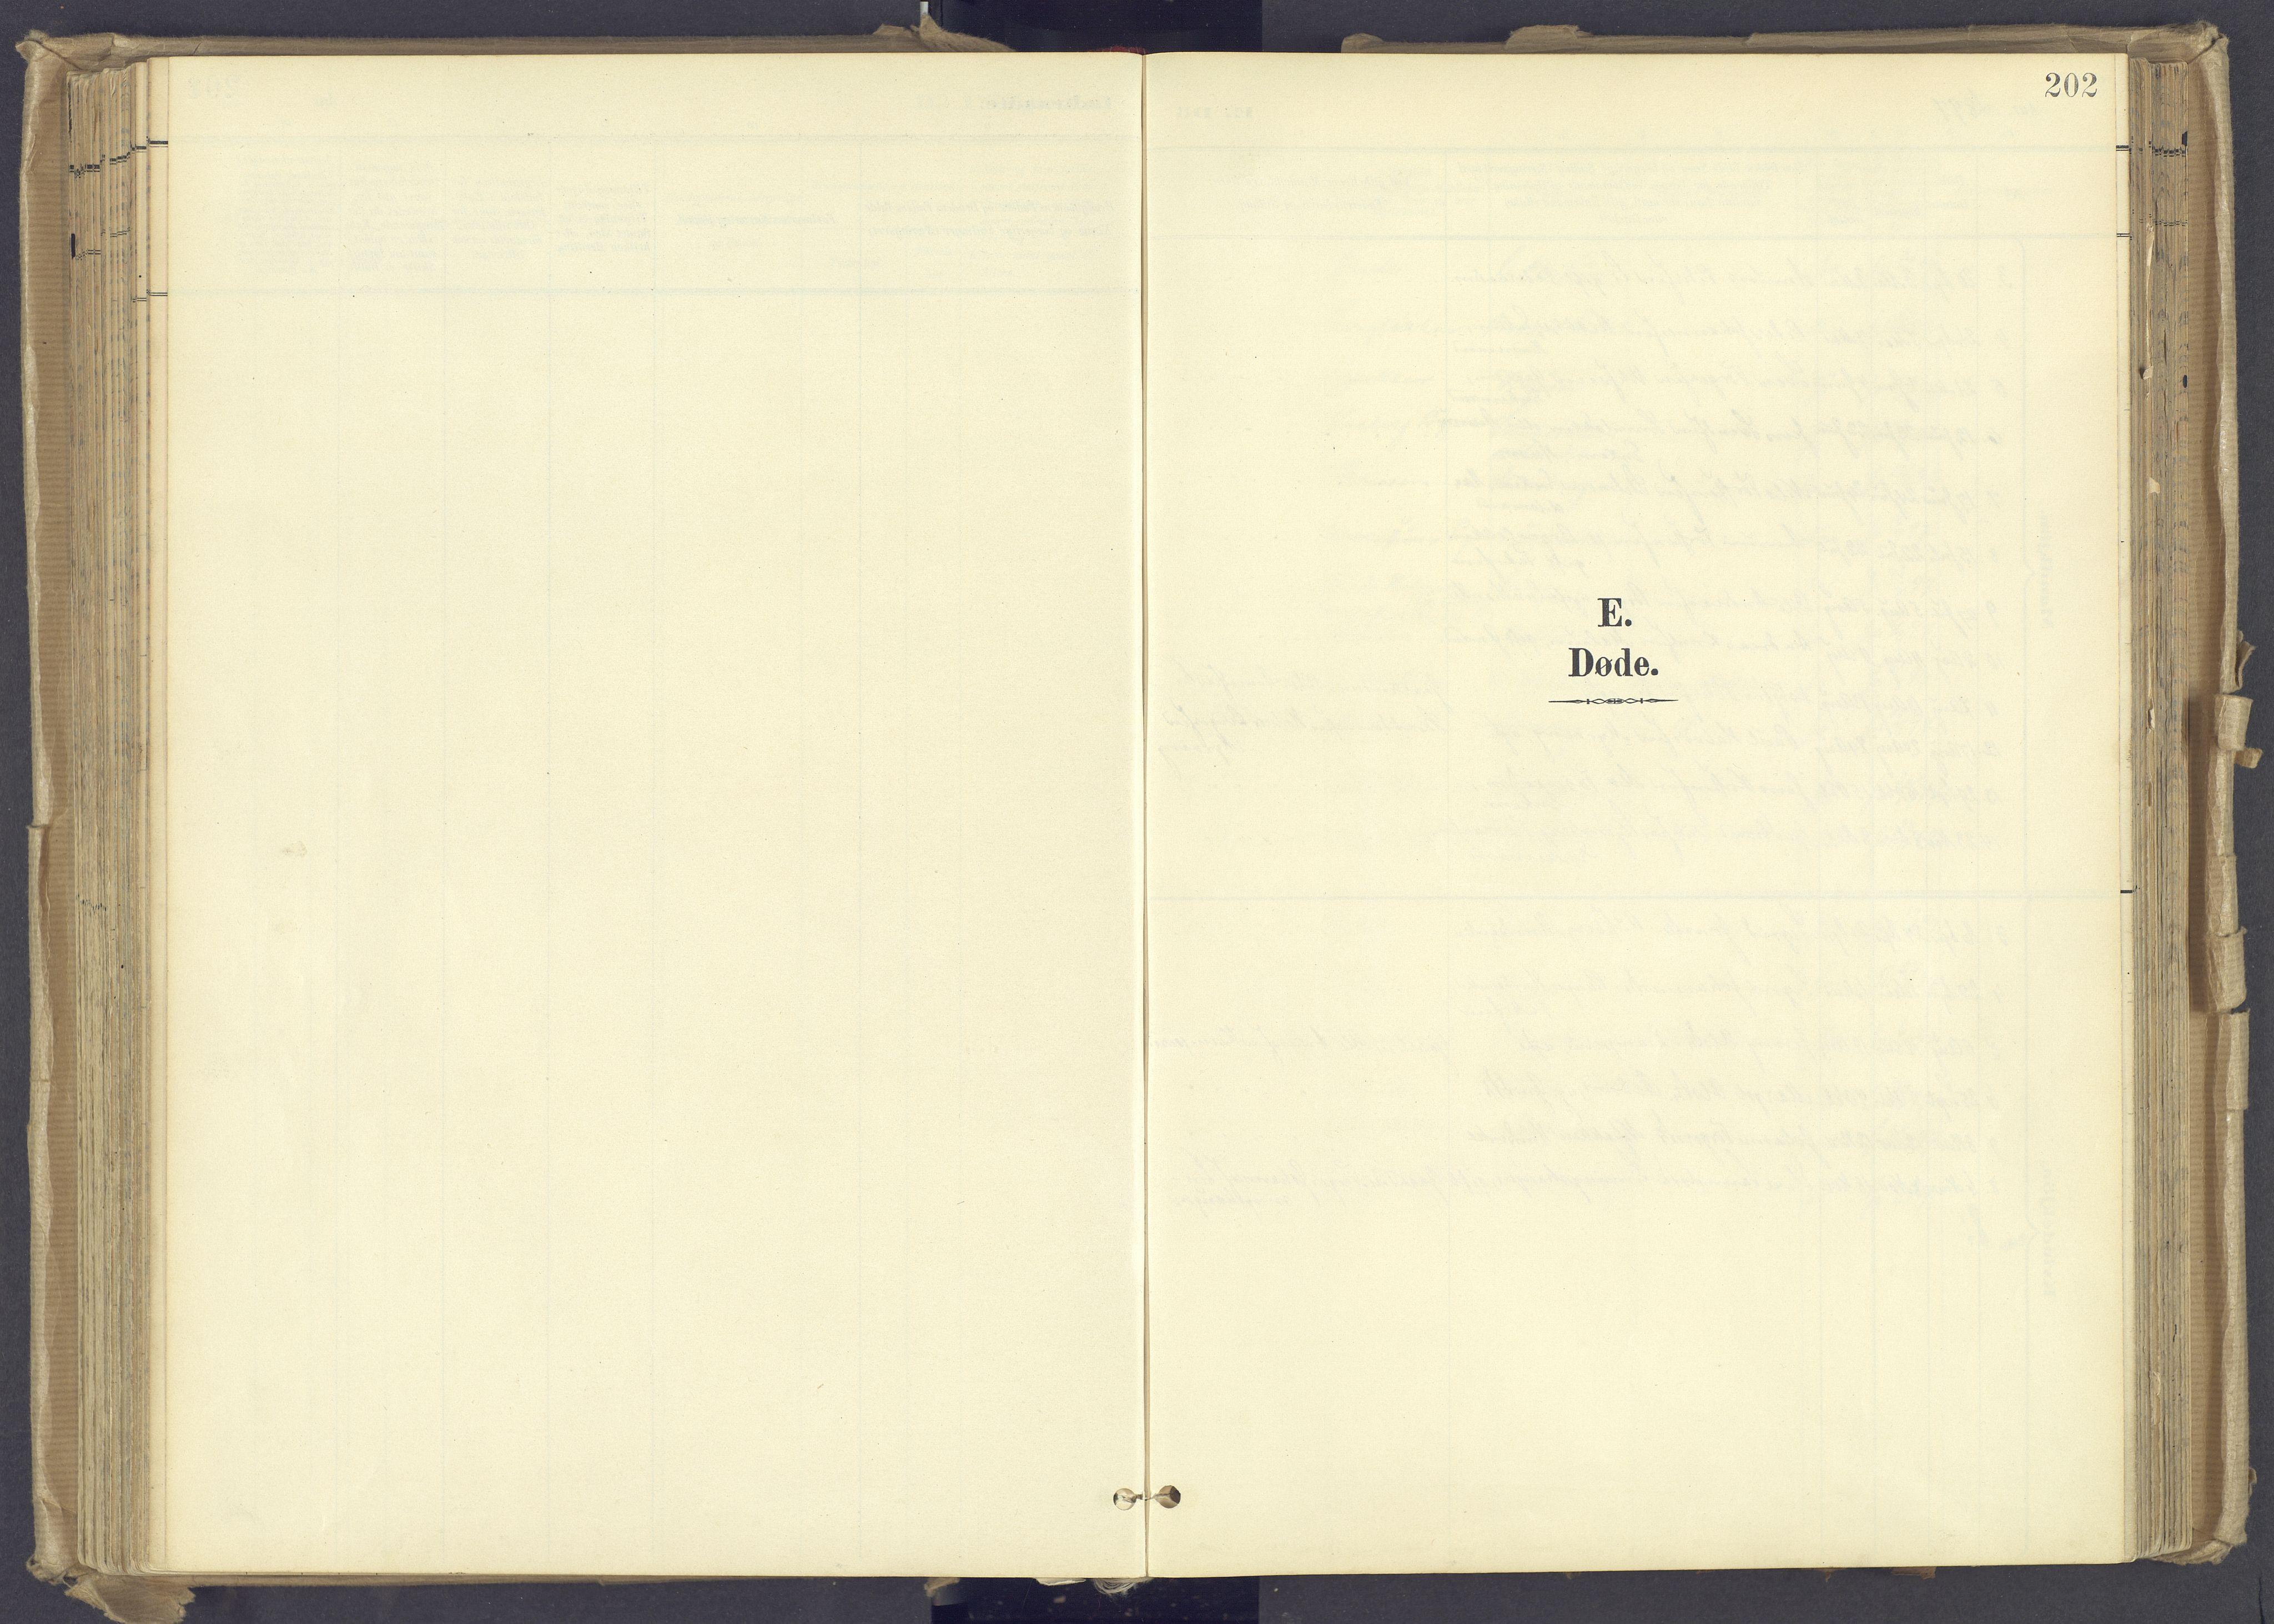 SAH, Øyer prestekontor, Ministerialbok nr. 12, 1897-1920, s. 202